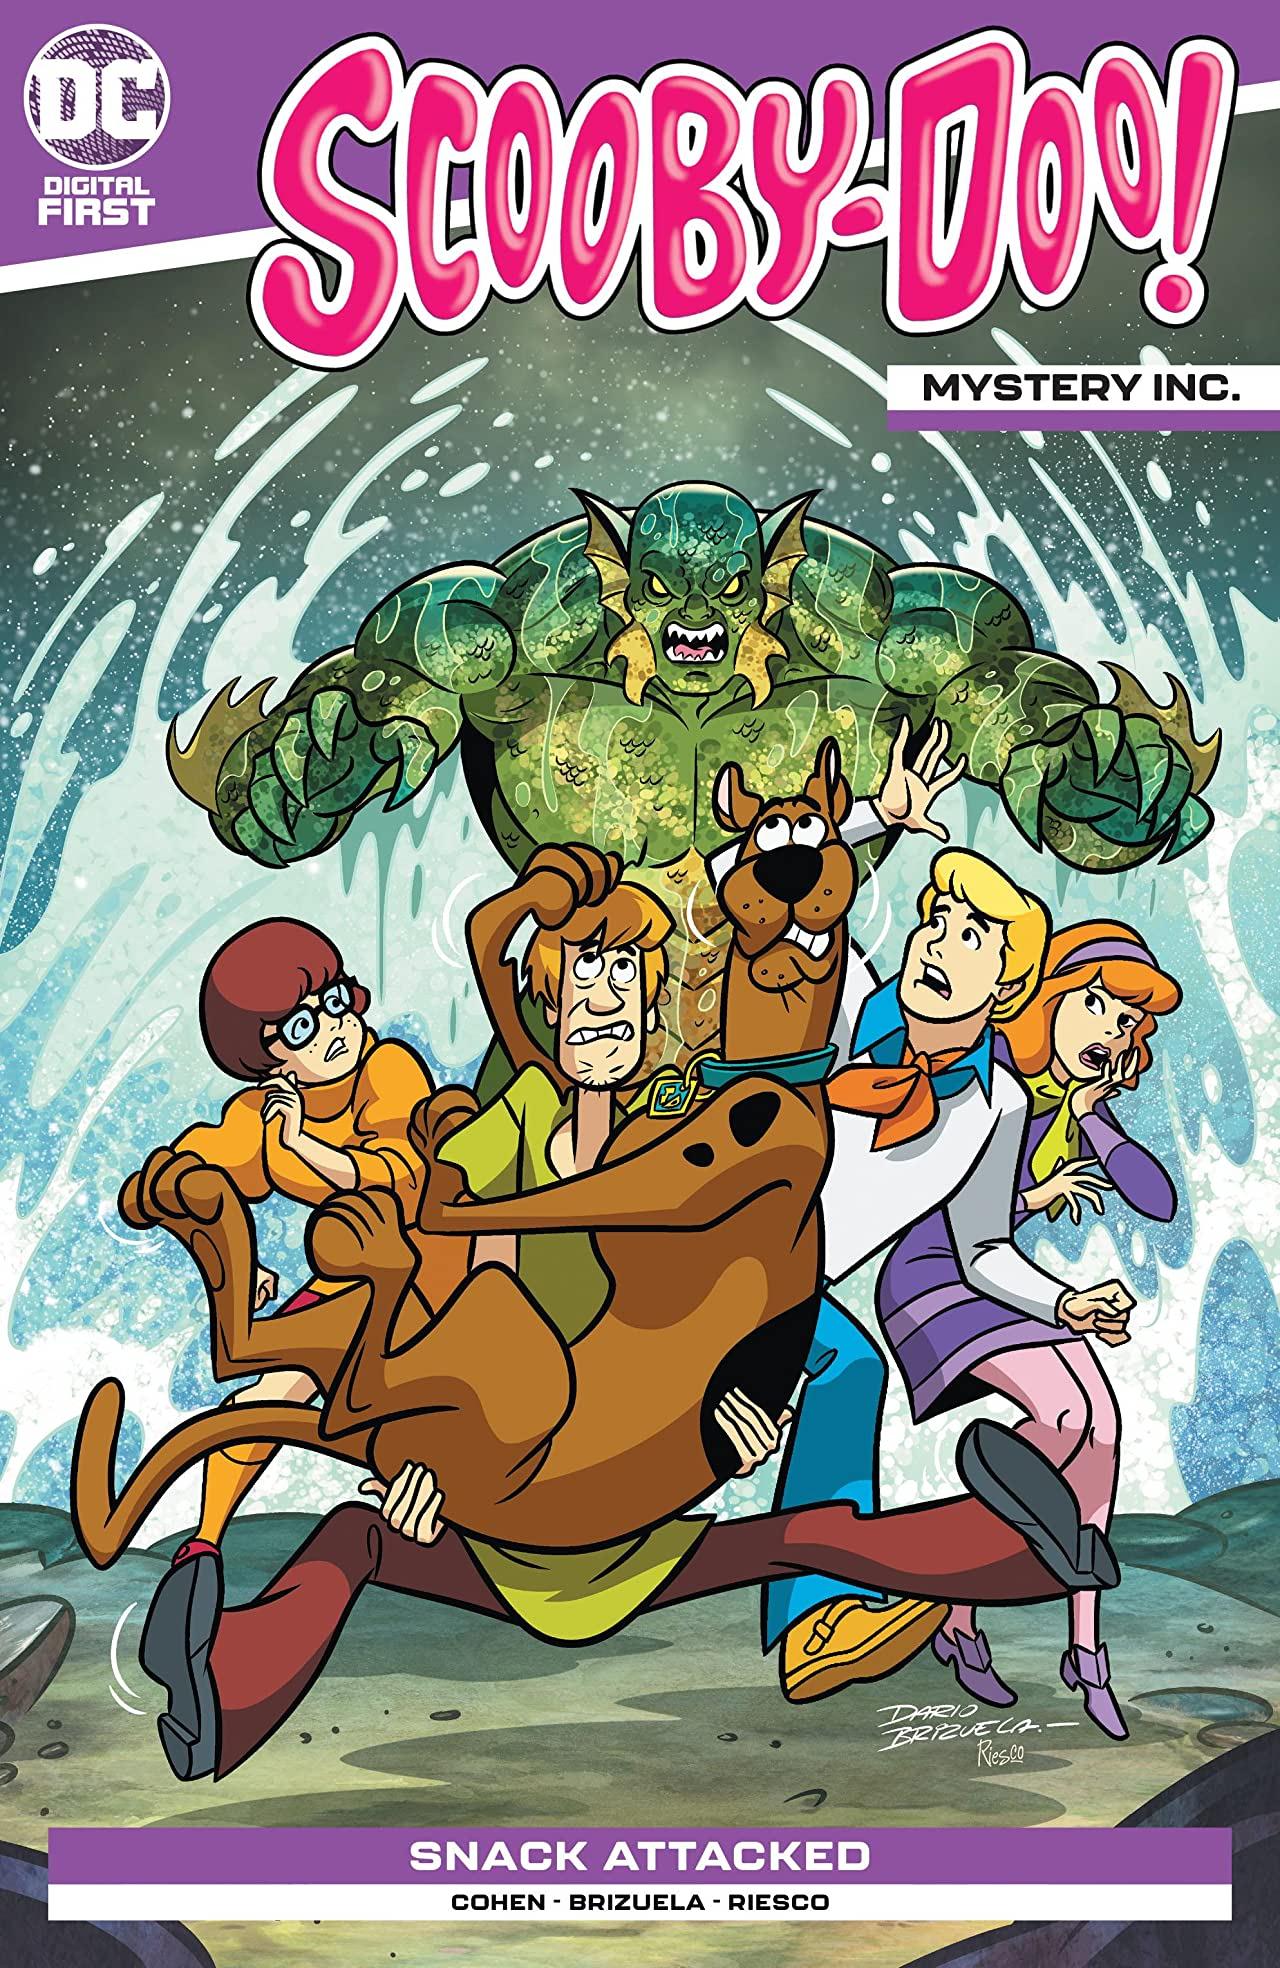 Scooby-Doo: Mystery Inc. Vol 1 (Digital)